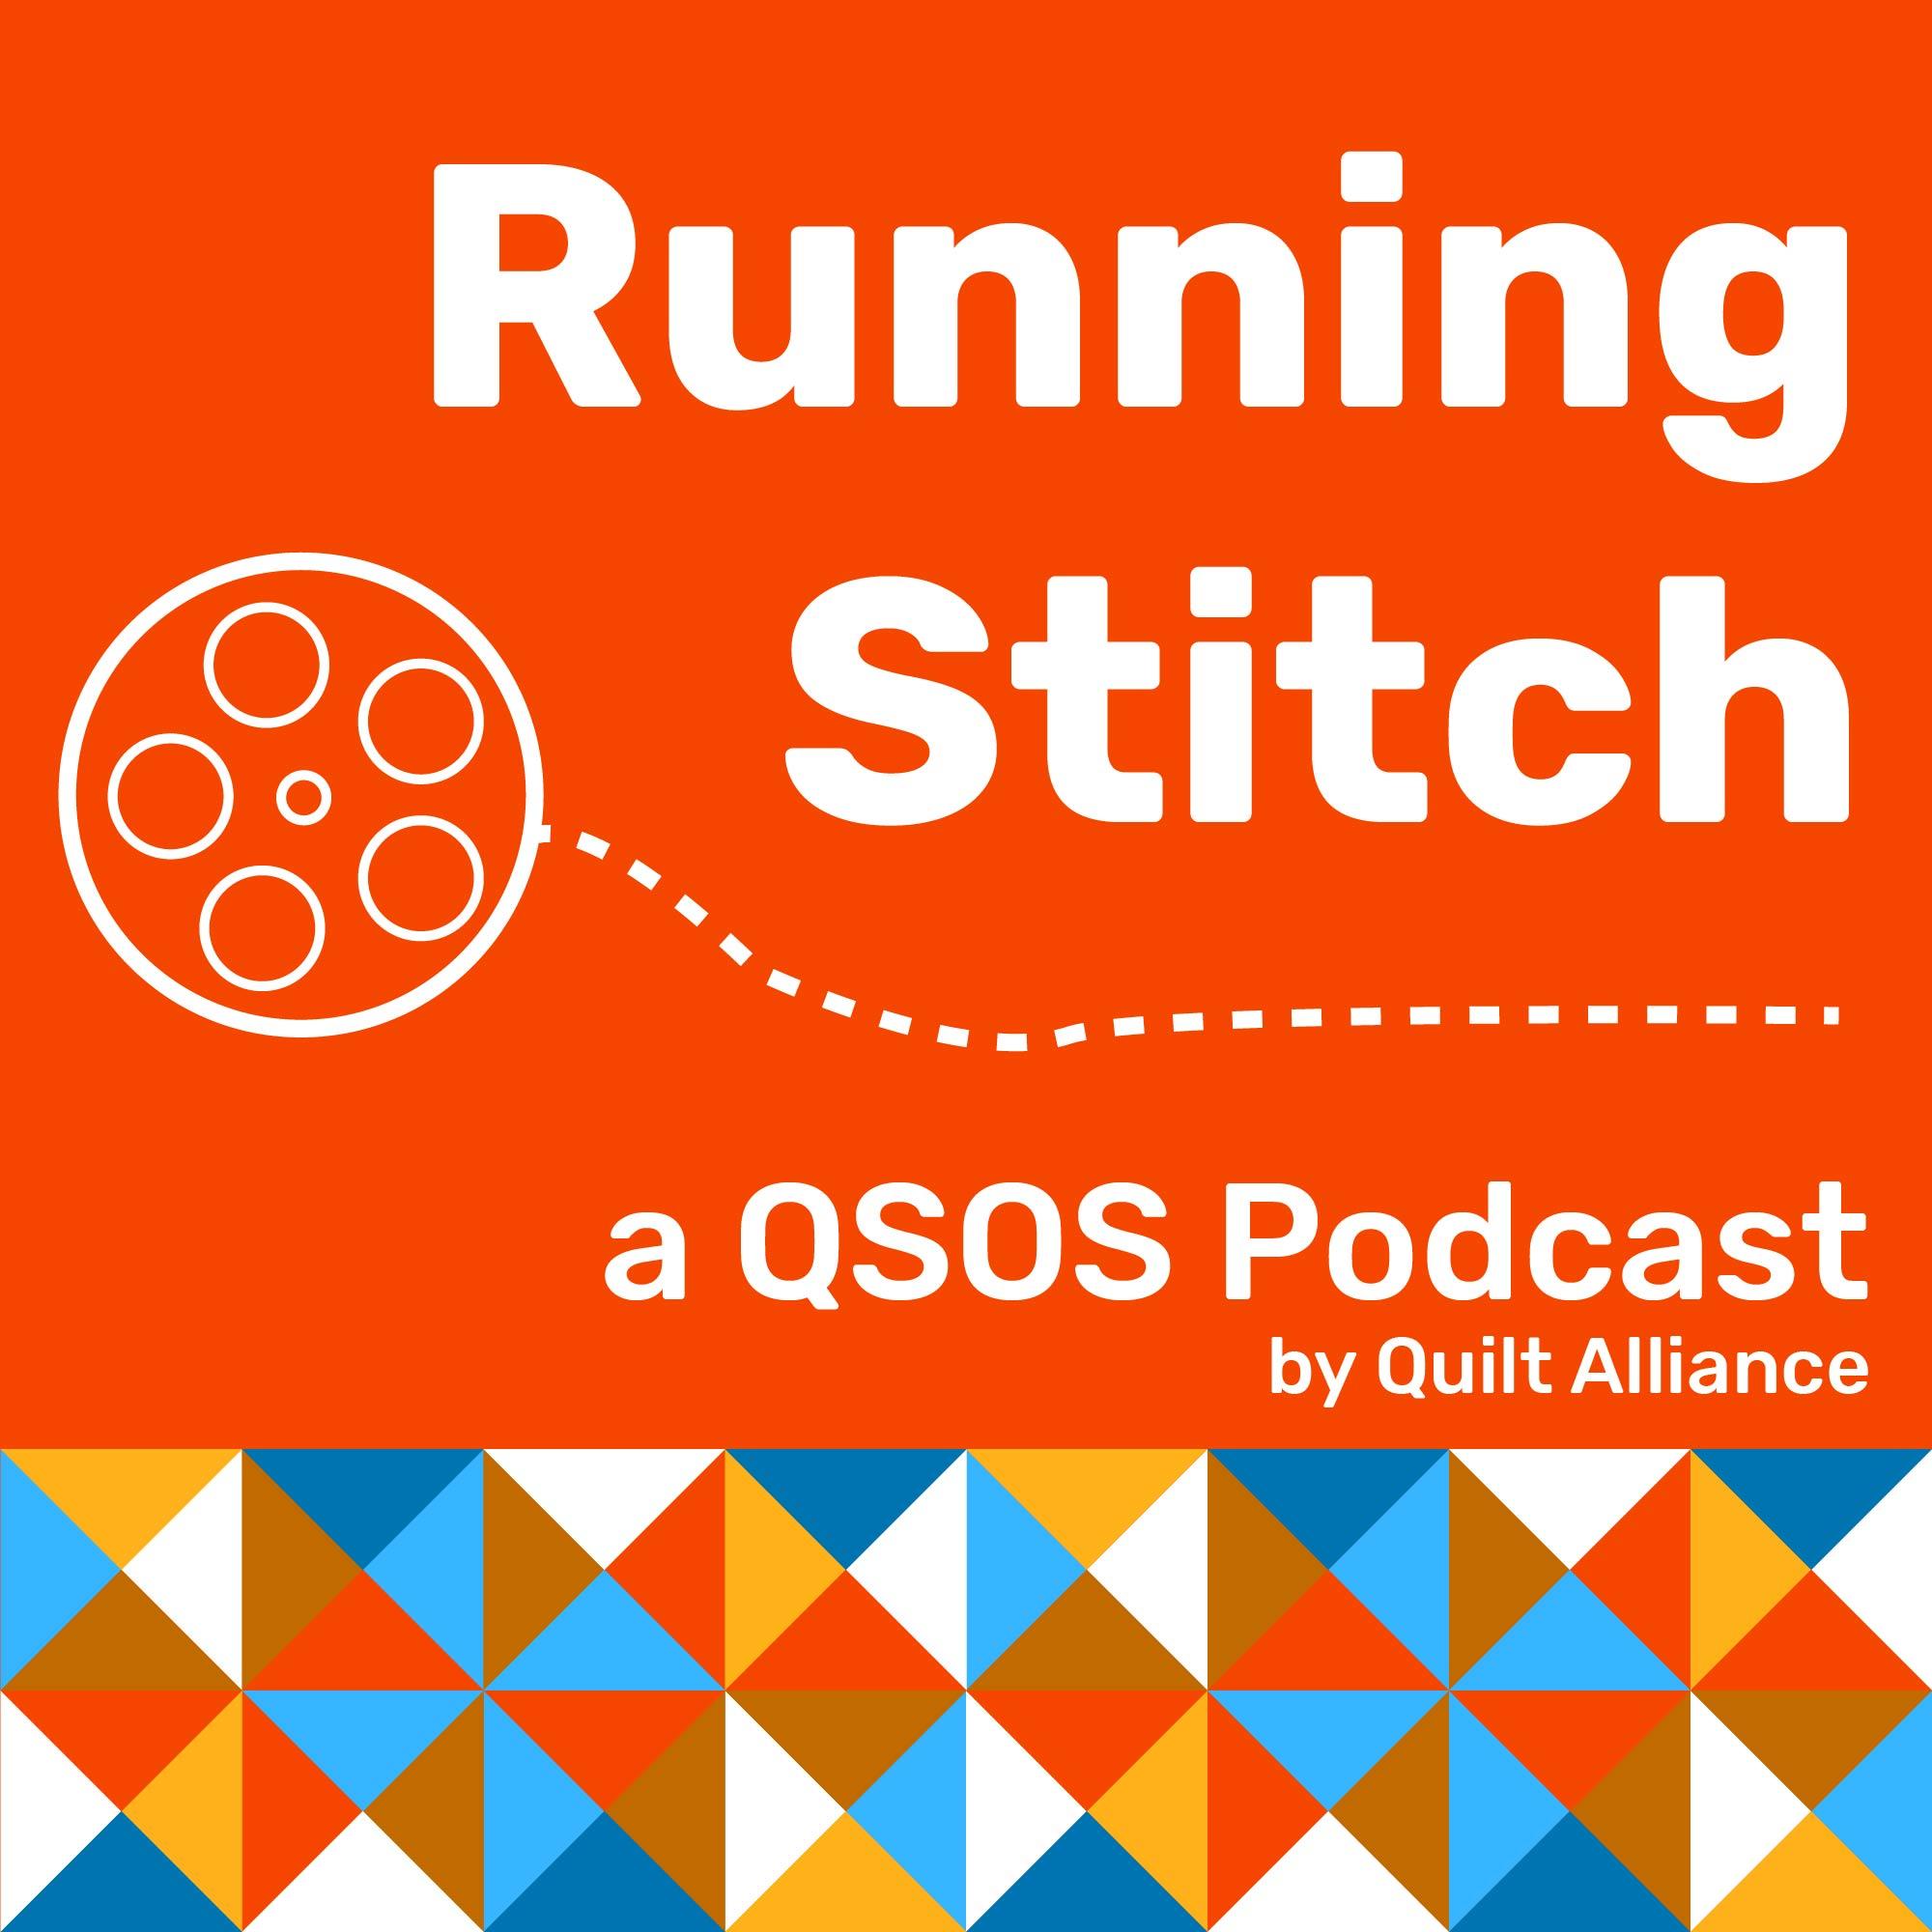 Introducing Running Stitch